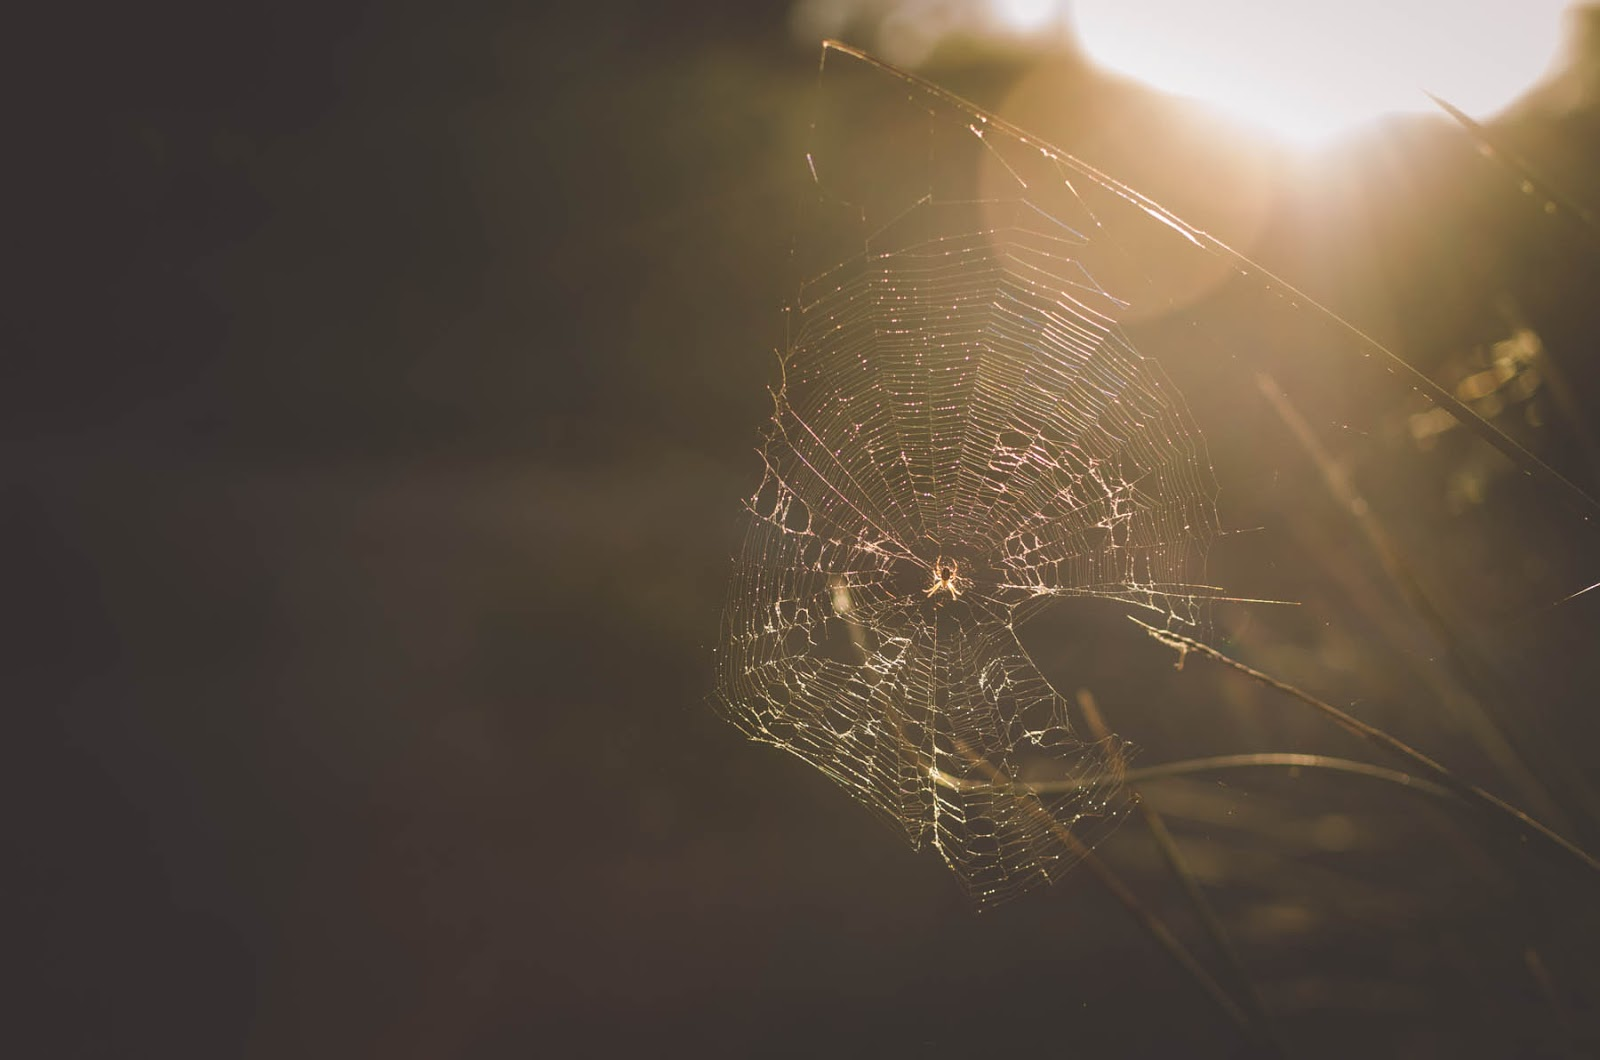 cobweb images